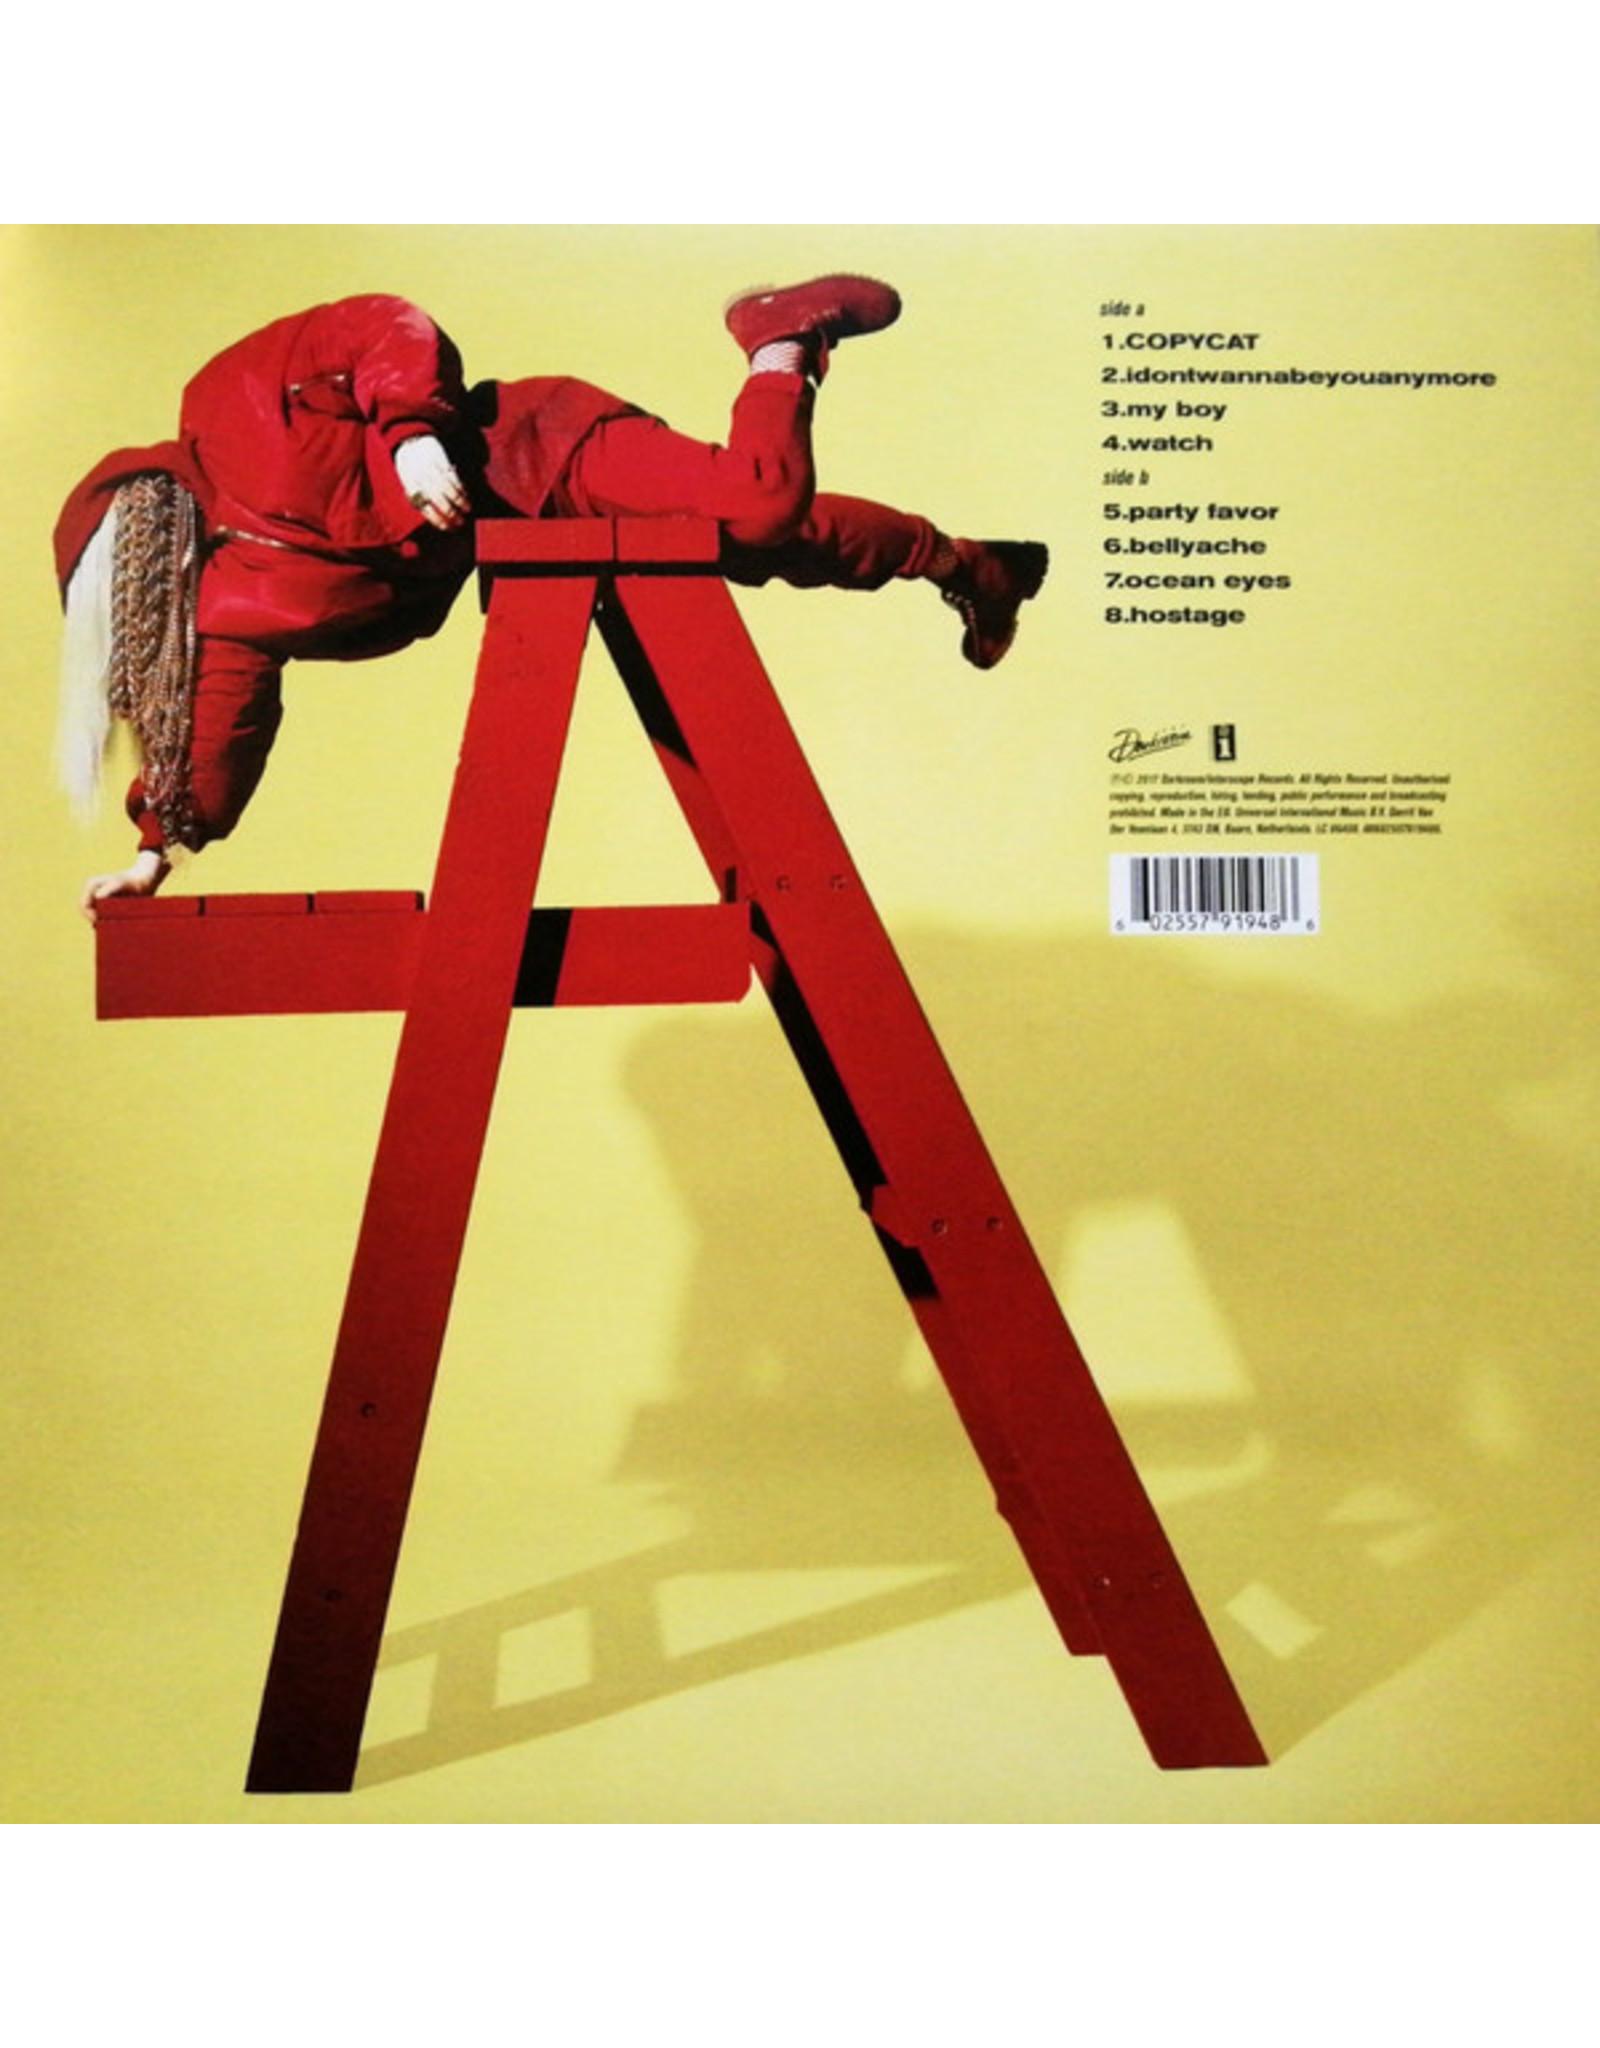 Billie Eilish - Don't Smile At Me (Red Vinyl)